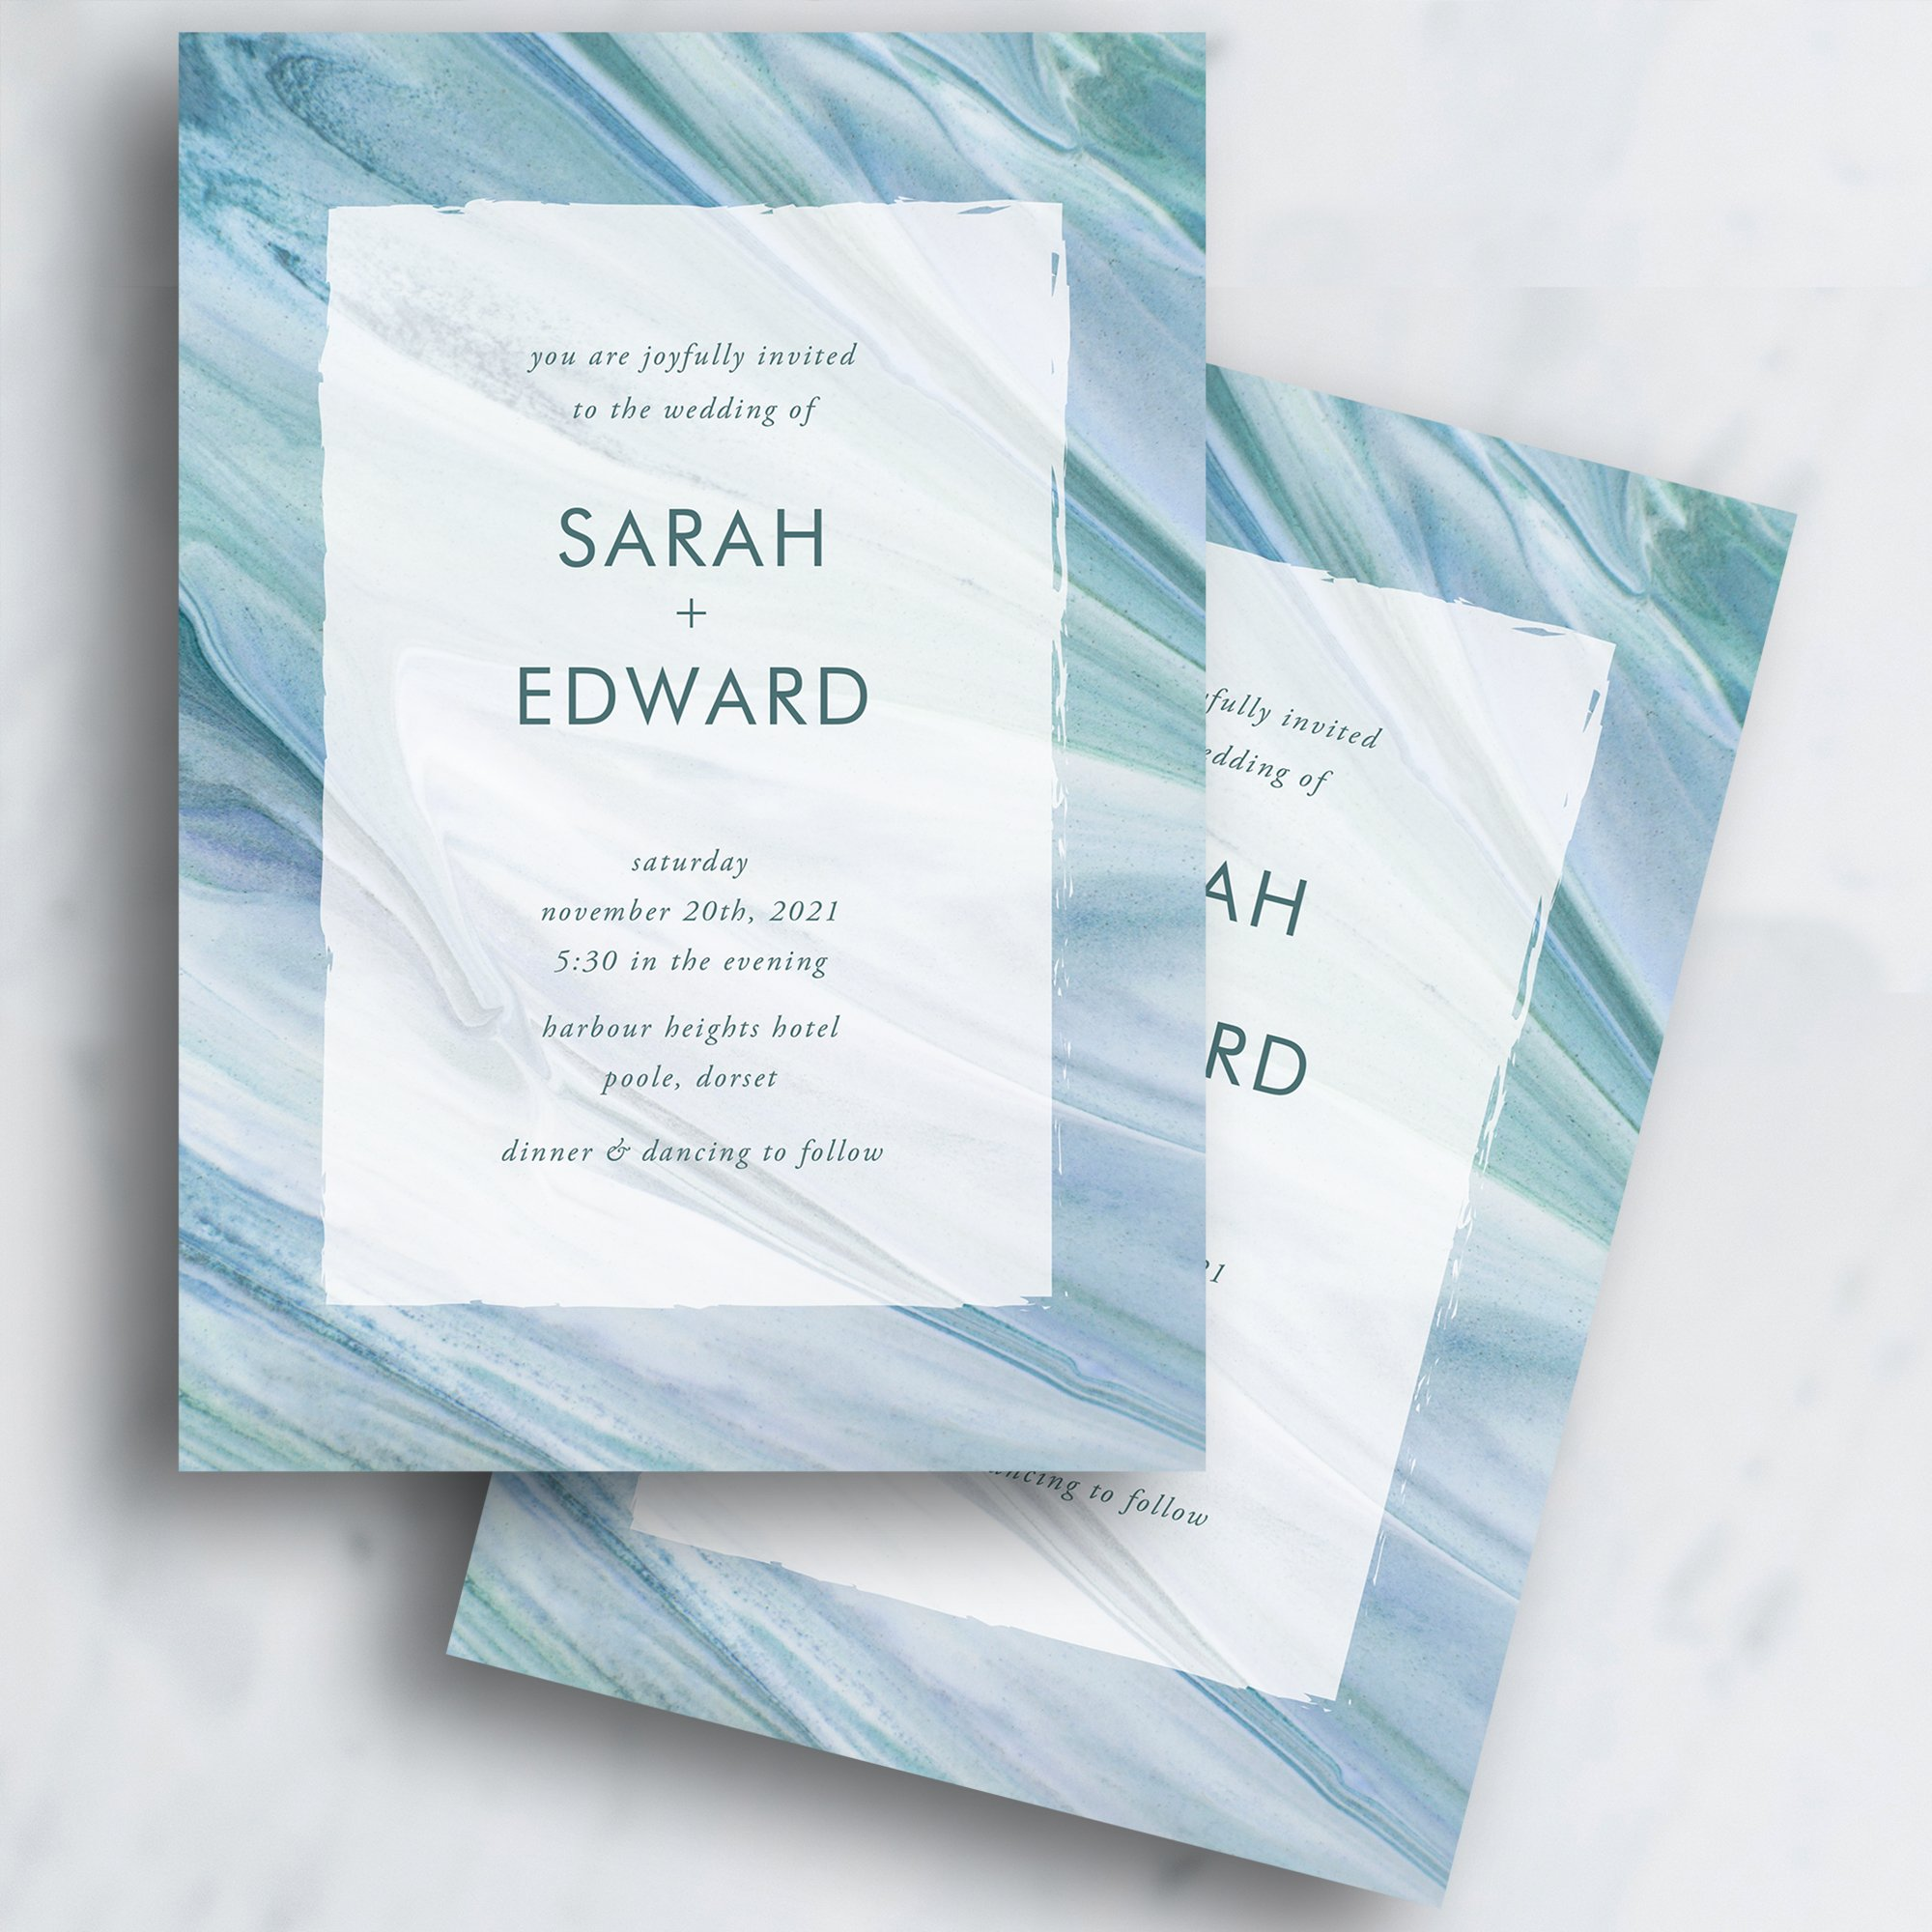 Flow Modern Wedding Invitation, Flamboyant Invites